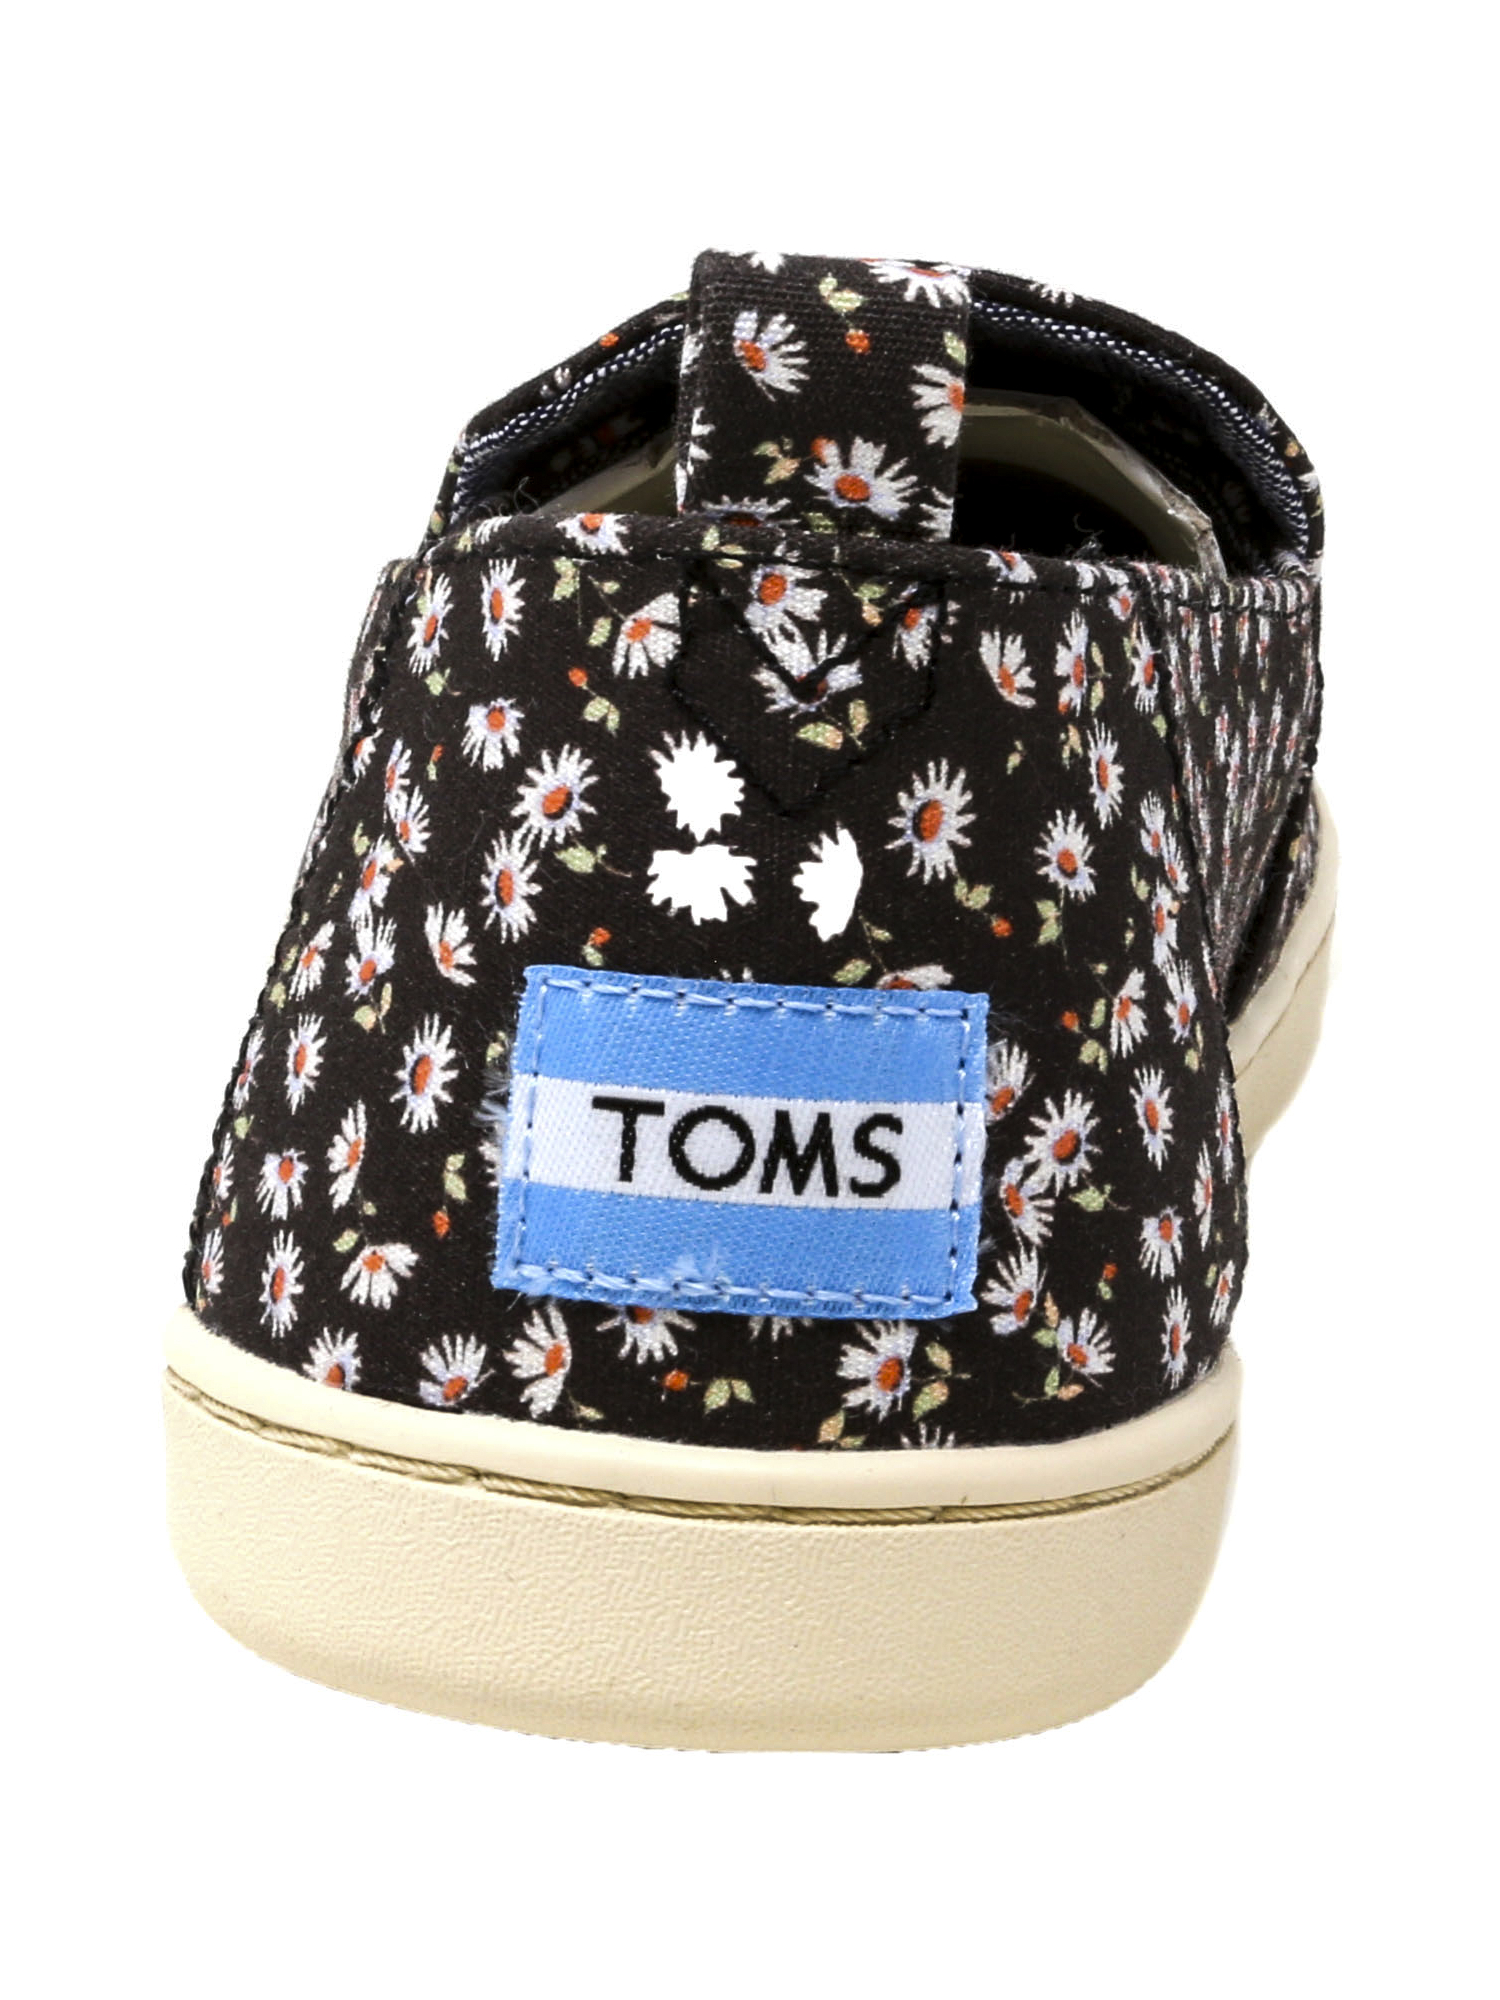 Toms-Women-039-s-Deconstructed-Alpargata-Canvas-Ankle-High-Slip-On-Shoes thumbnail 5